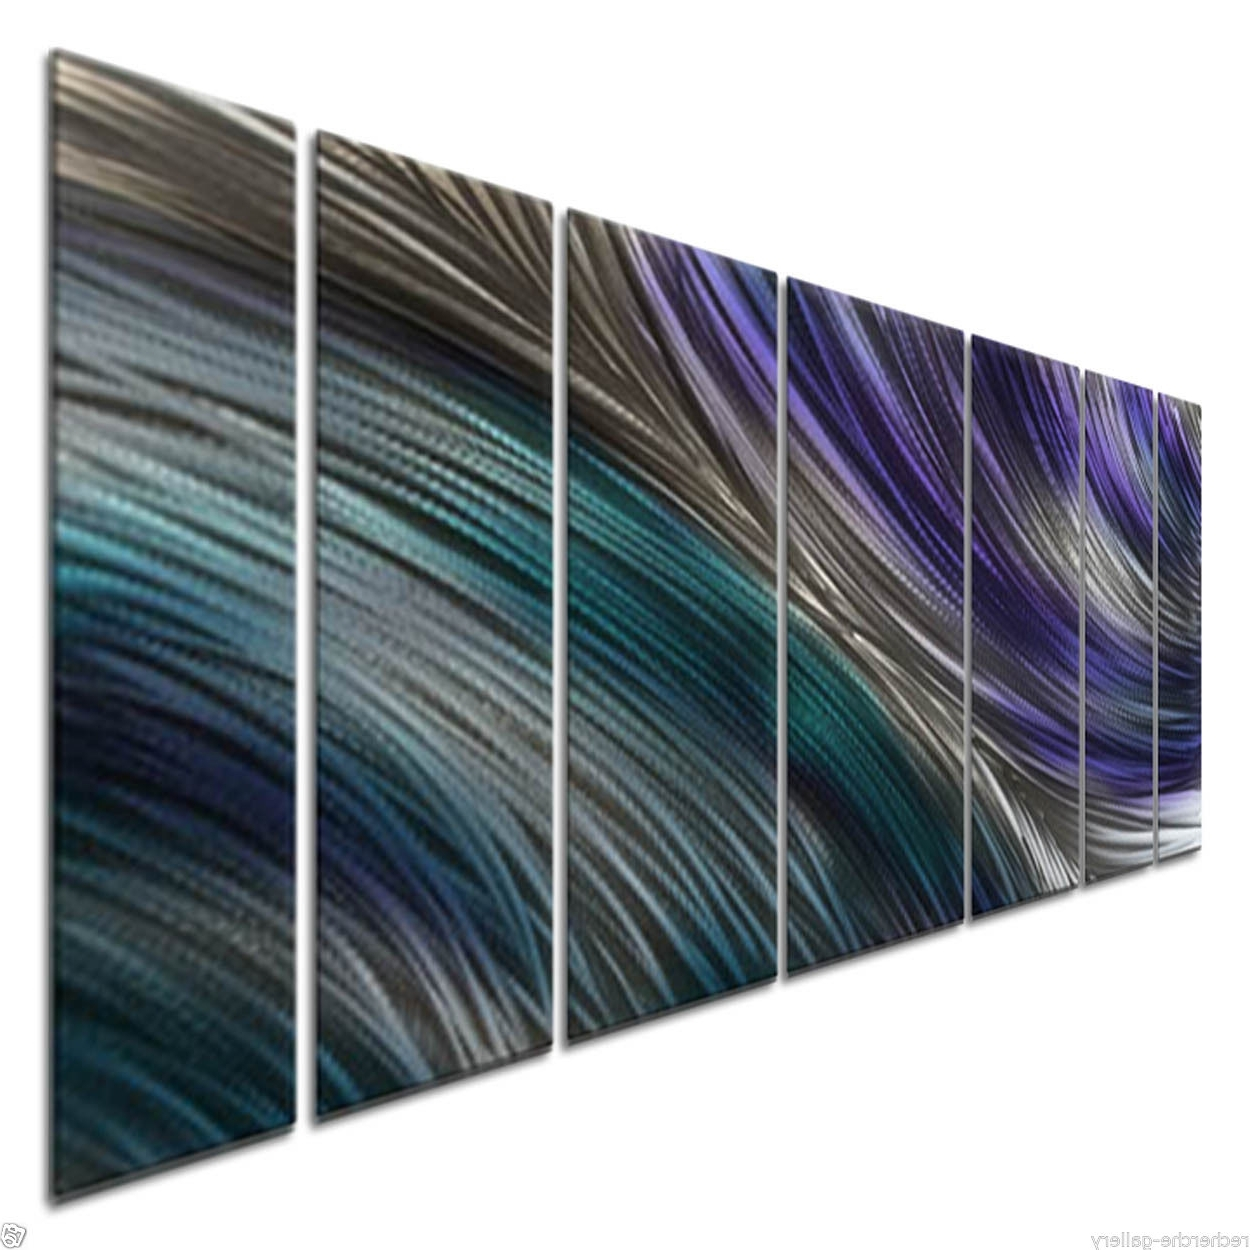 Ash Carl Metal Art In Favorite Cool Collision Metal Artash Carl Contemporary Home Decor Wall (View 4 of 15)